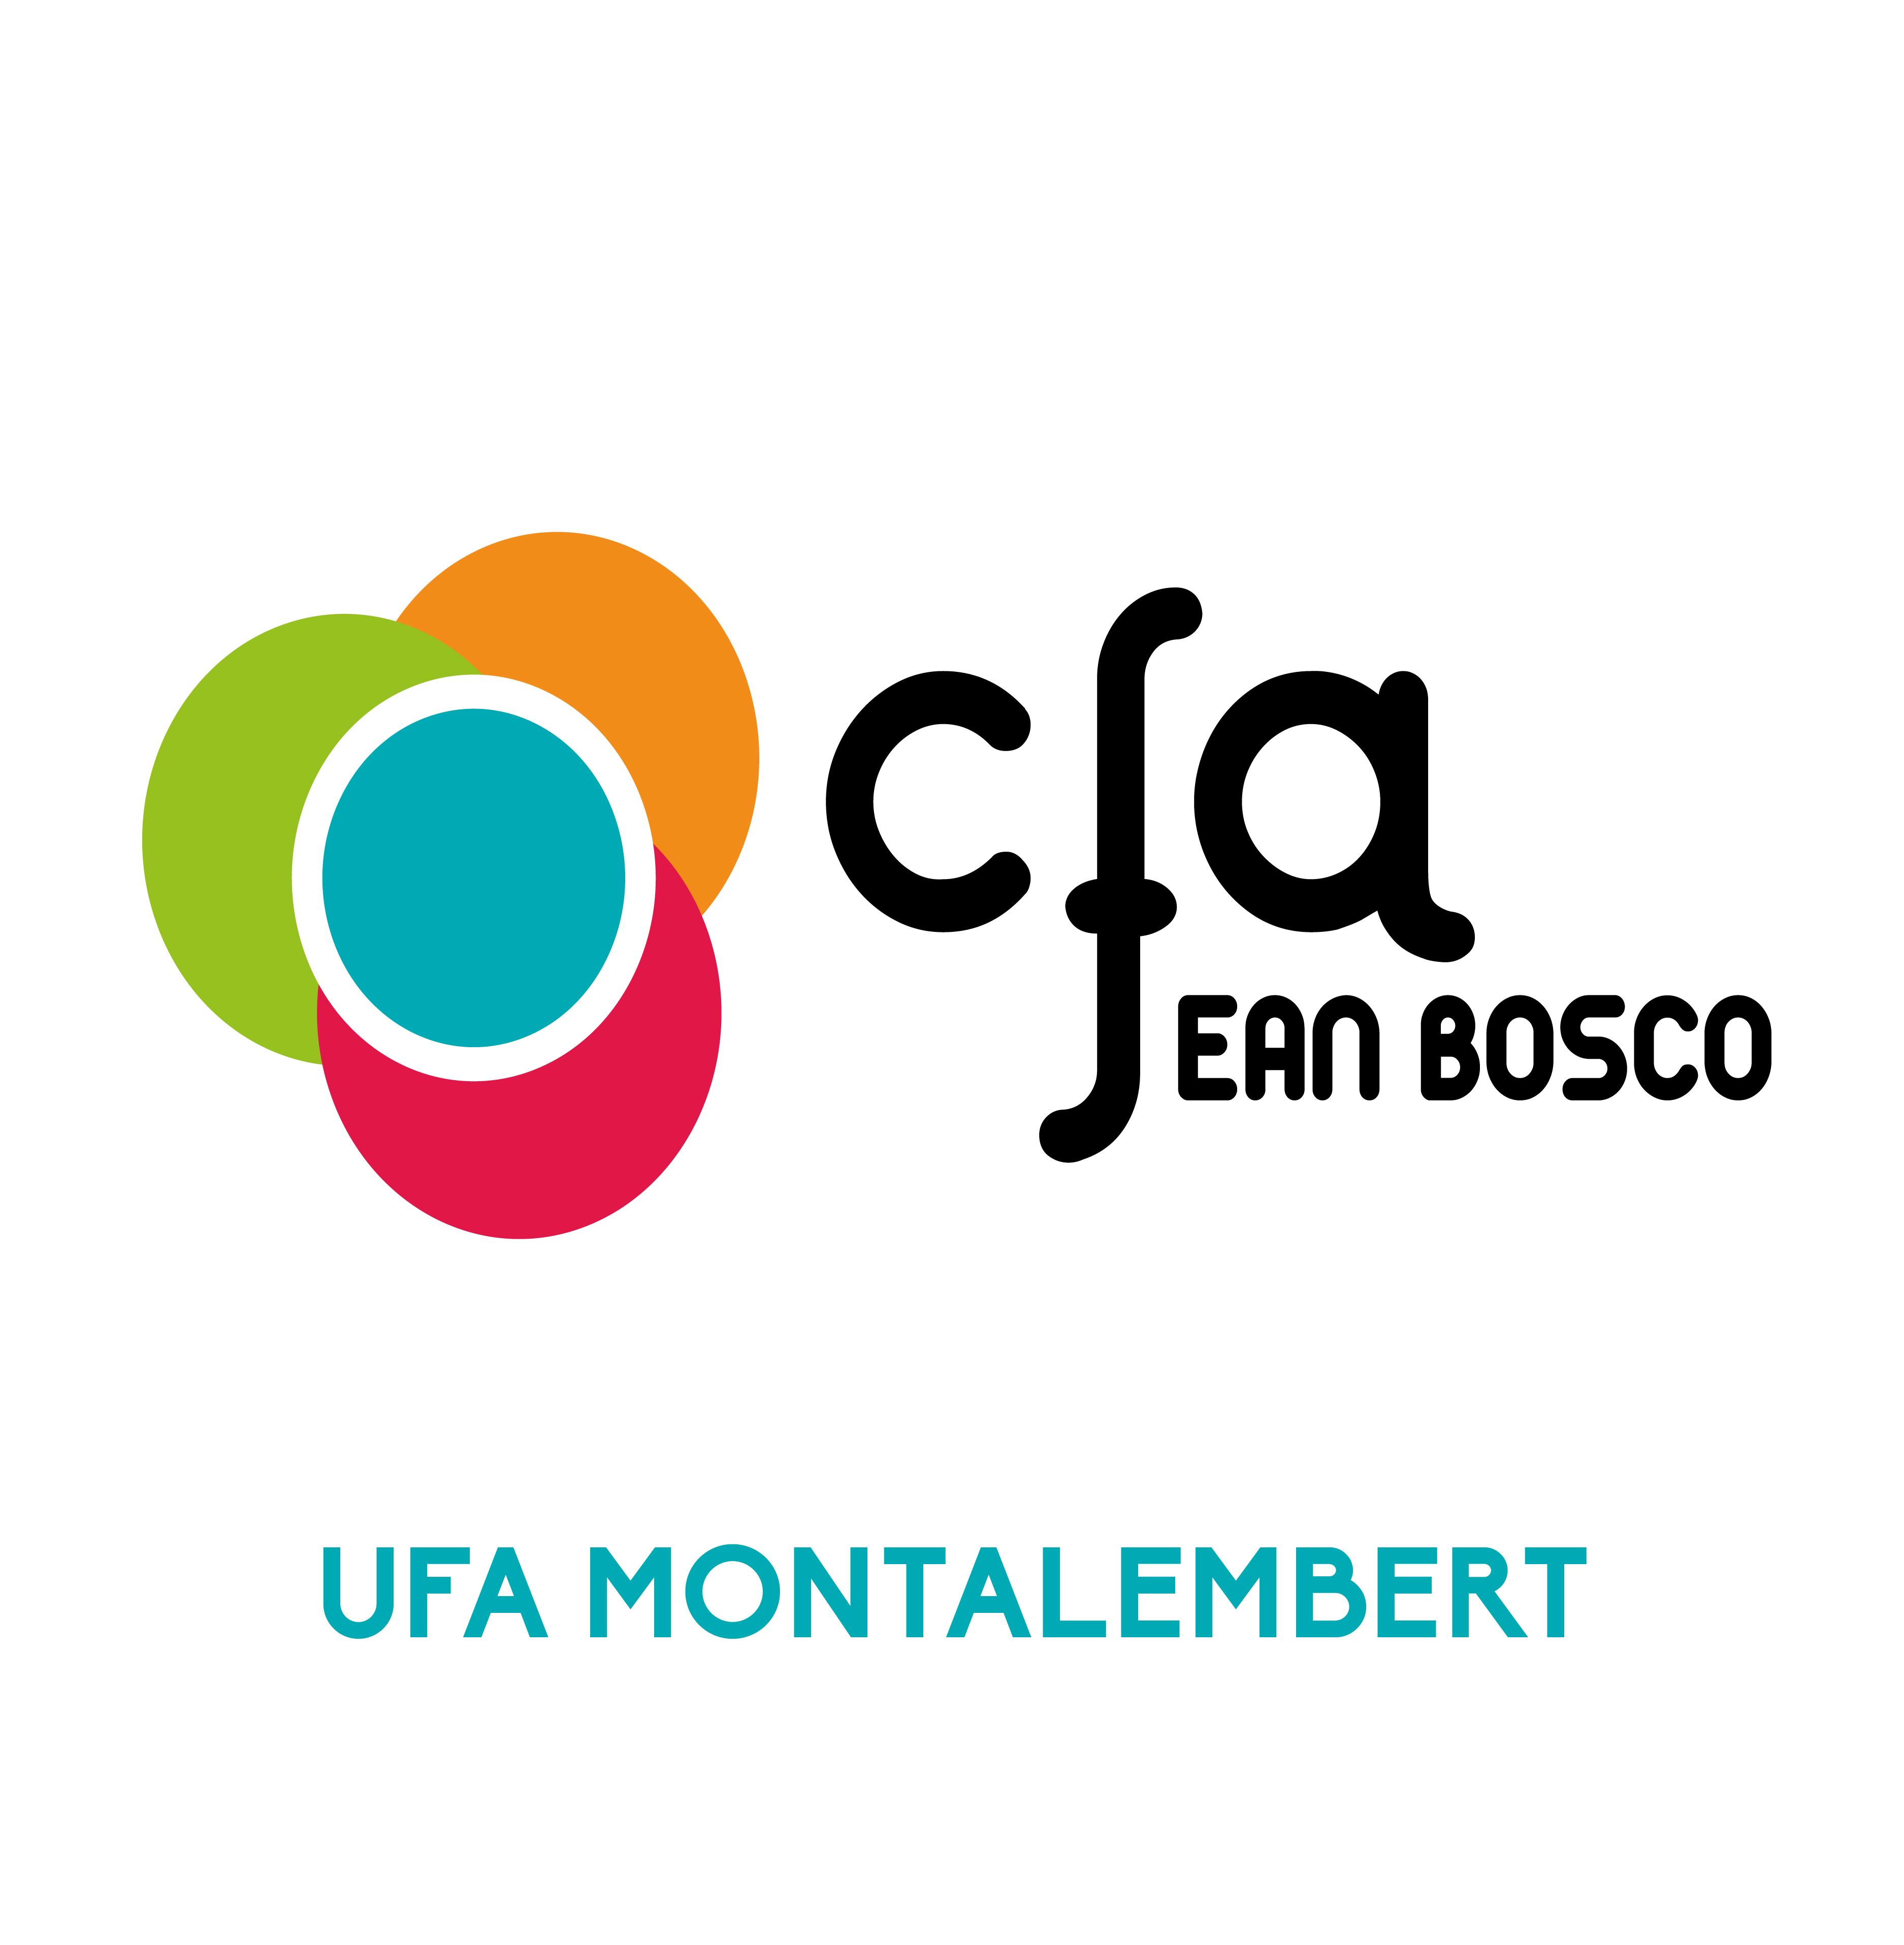 LOGO CFA-MONTALEMBERT